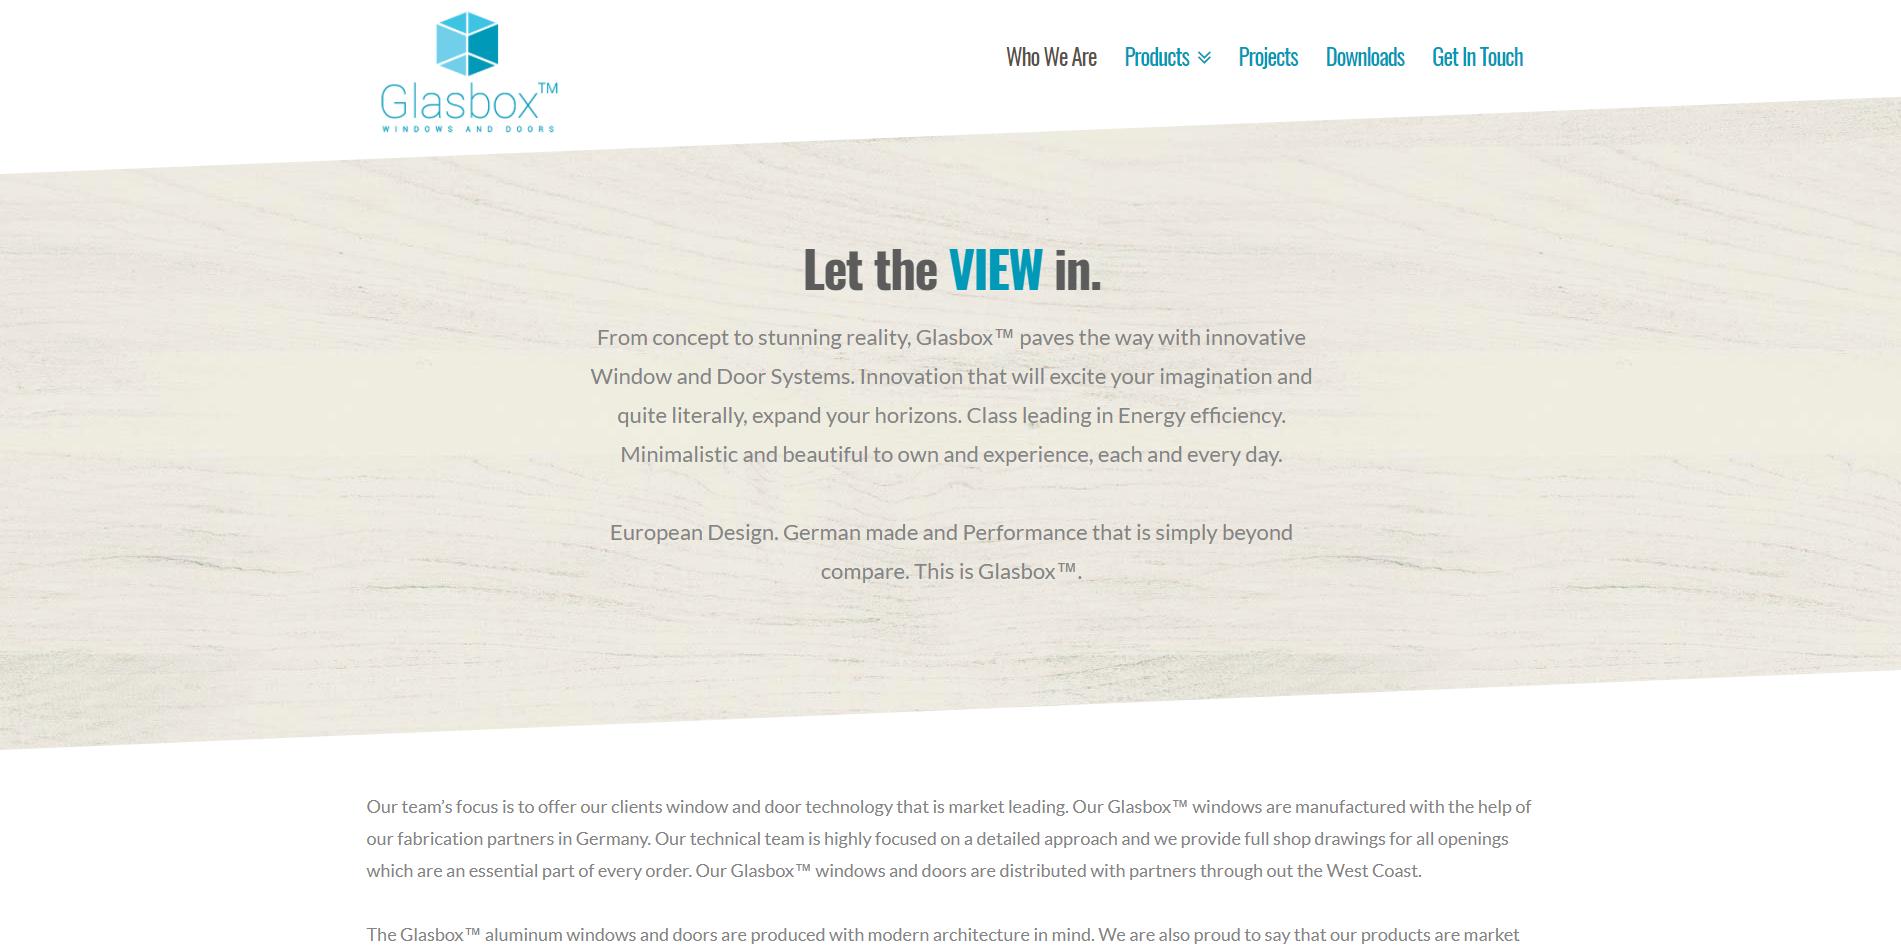 GlasBox - Manufacturer Web Design